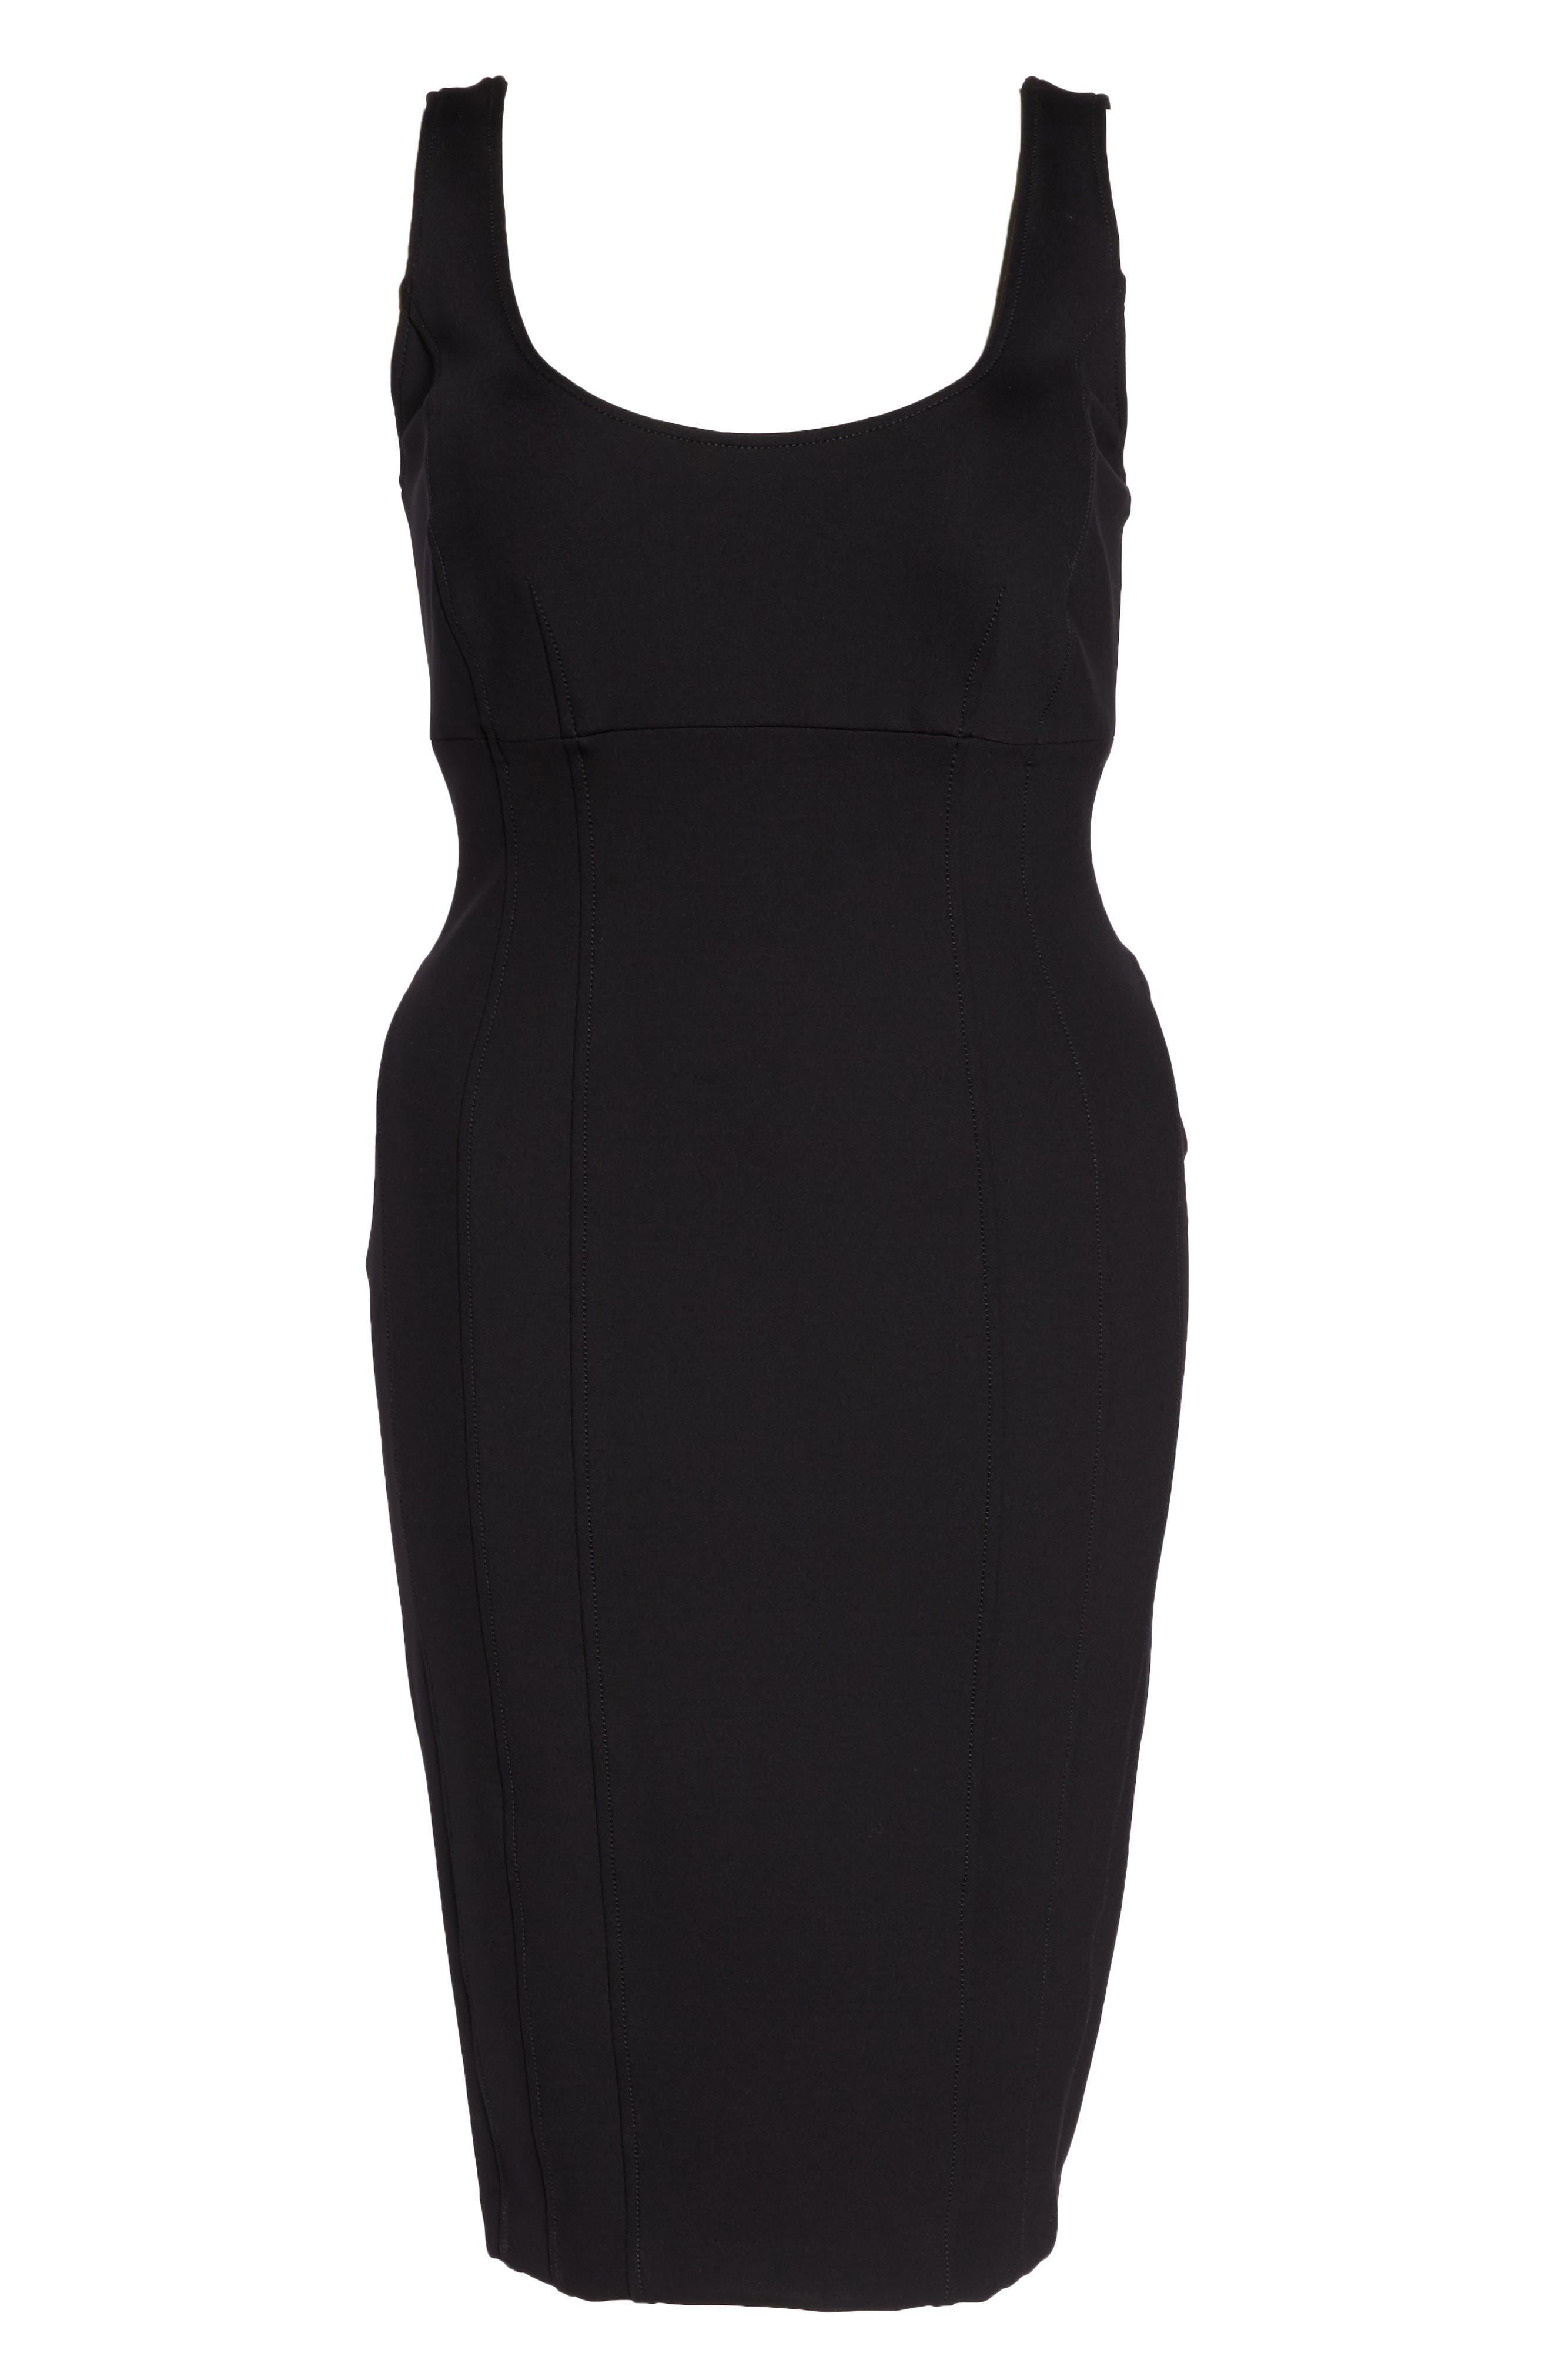 Ashley Graham x Marina Rinaldi Octopus Jersey Tube Dress (Regular & Plus Size)